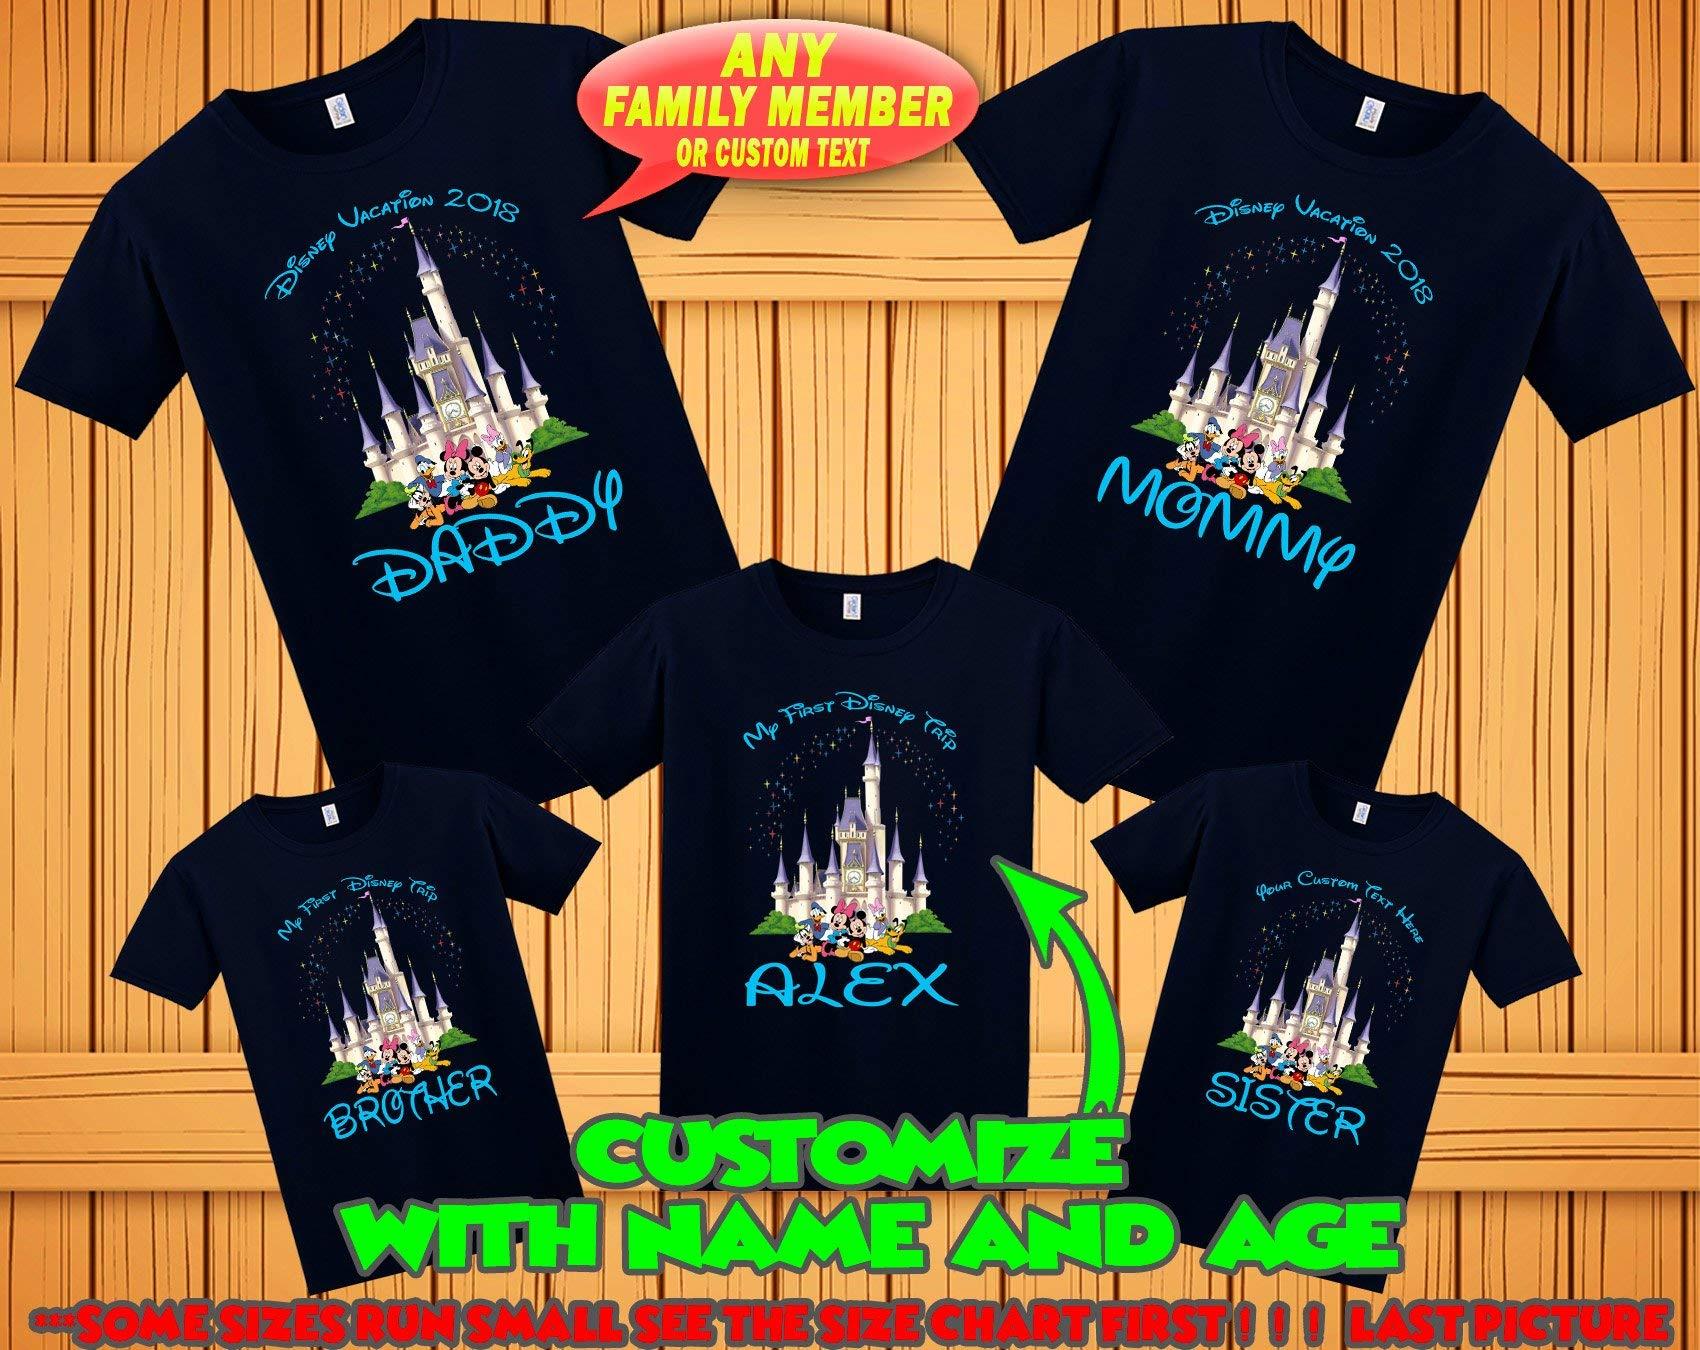 Disney family matching custom t-shirts, Family vacation disney shirts, custom Personalized disney shirt, Personalized Disney Shirts for Family